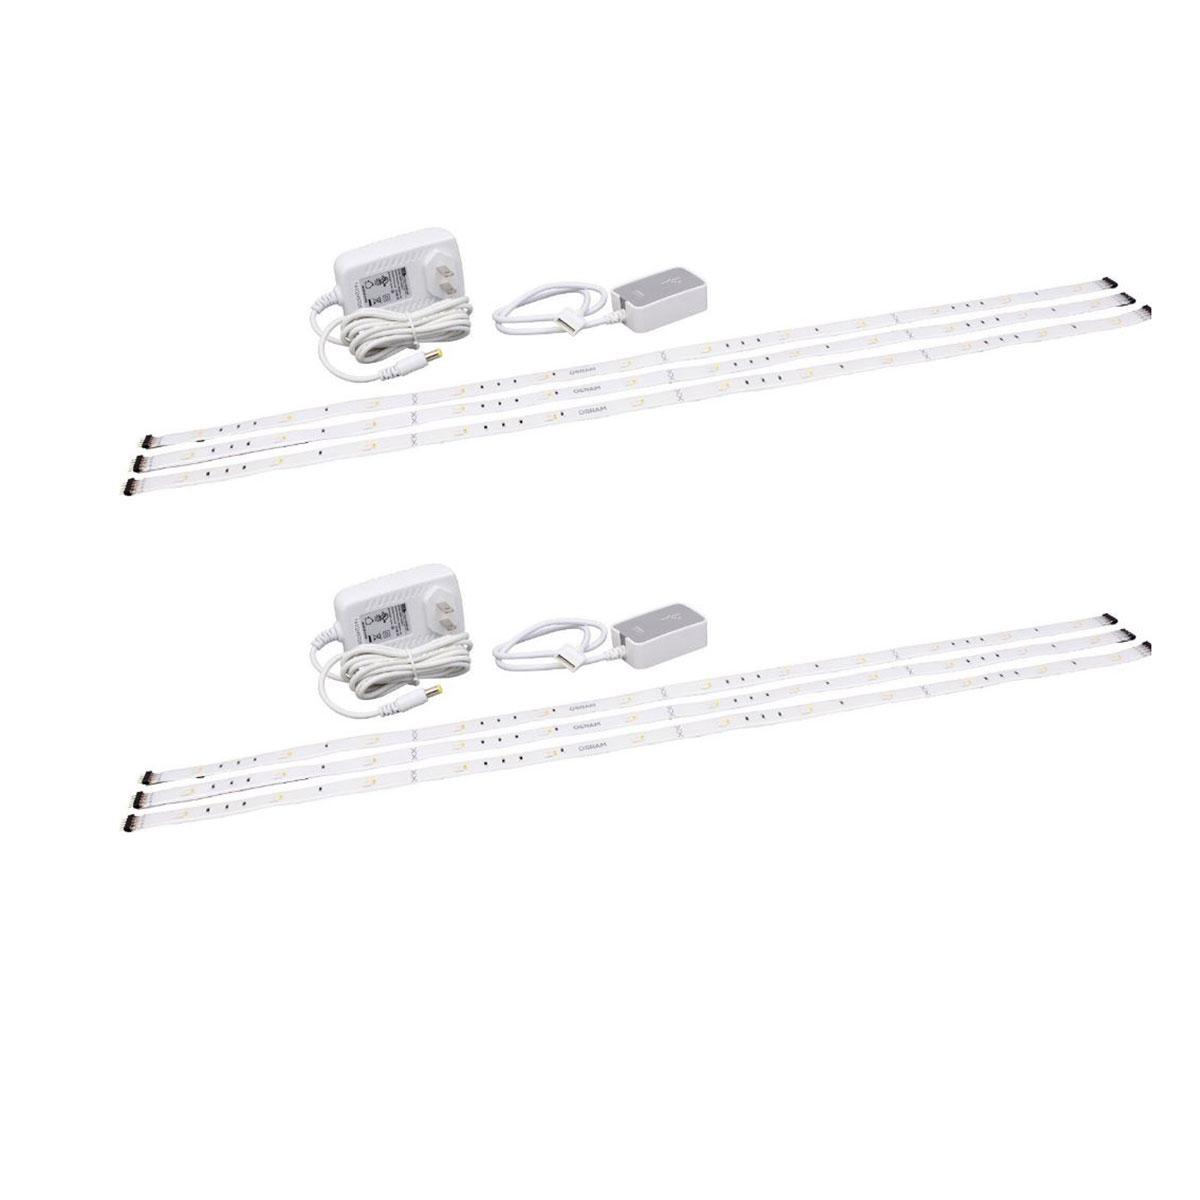 Sylvania Lightify Osram Flex RGBW LED Smart Connected 3 2